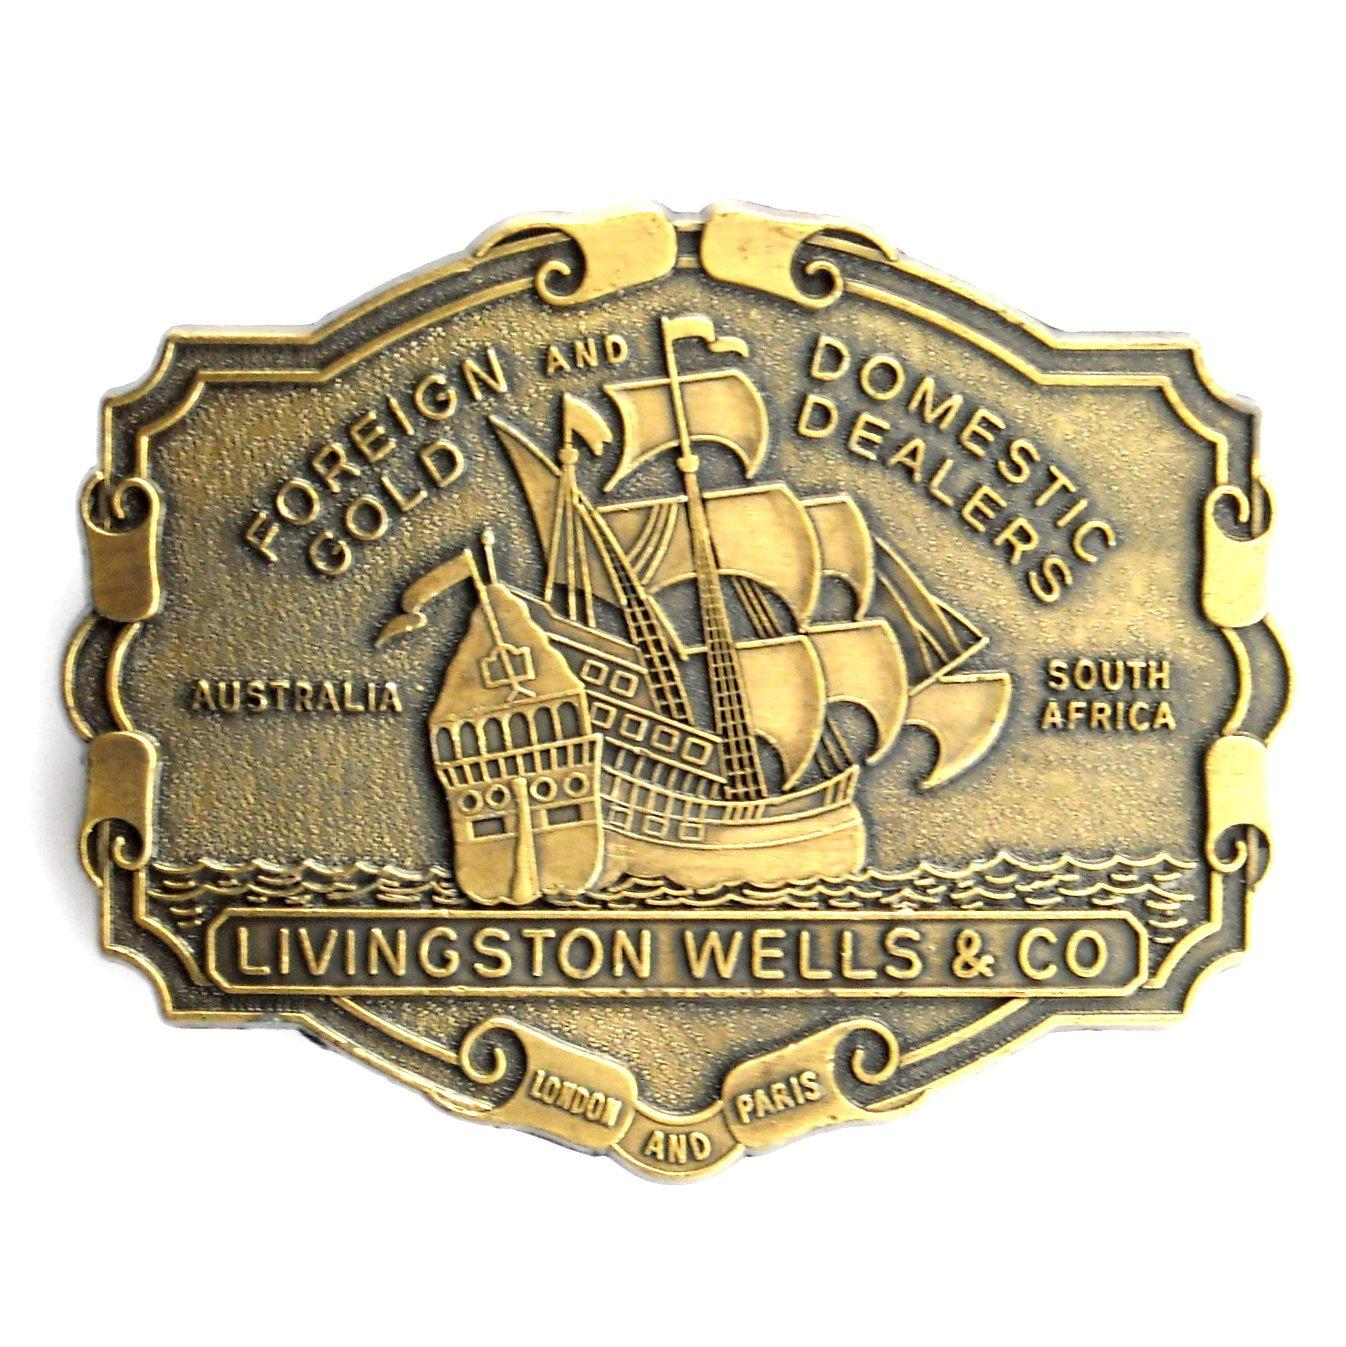 Gold Dealers Foreign Domestic Livingston Wells Belt Buckle